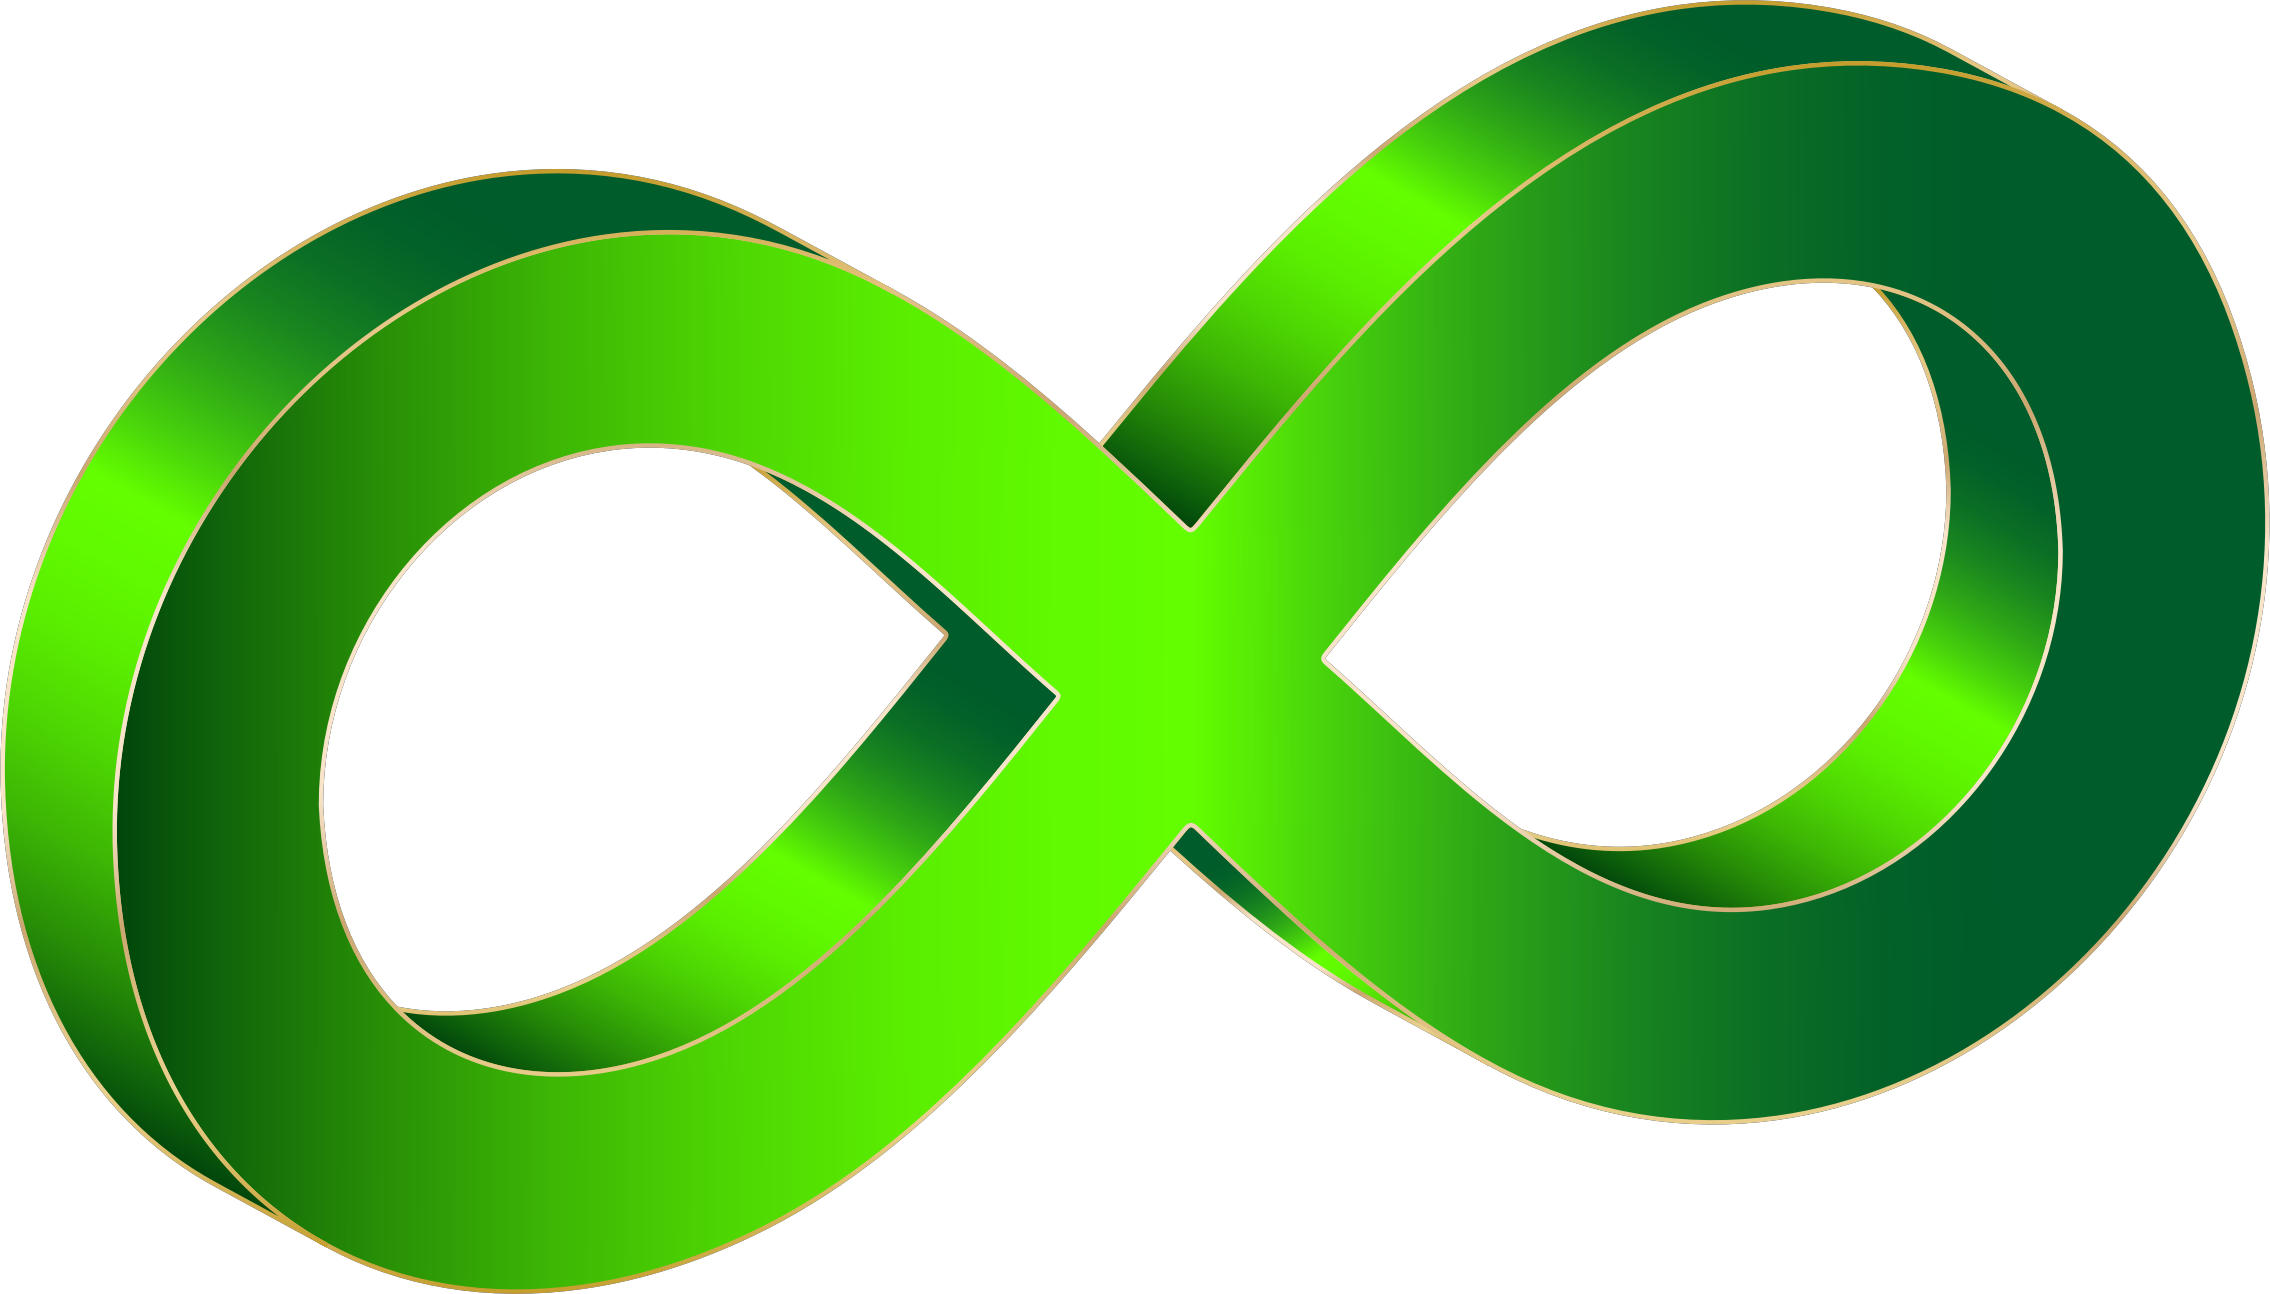 Clipart - 3D Infinity Symbol Variation 6